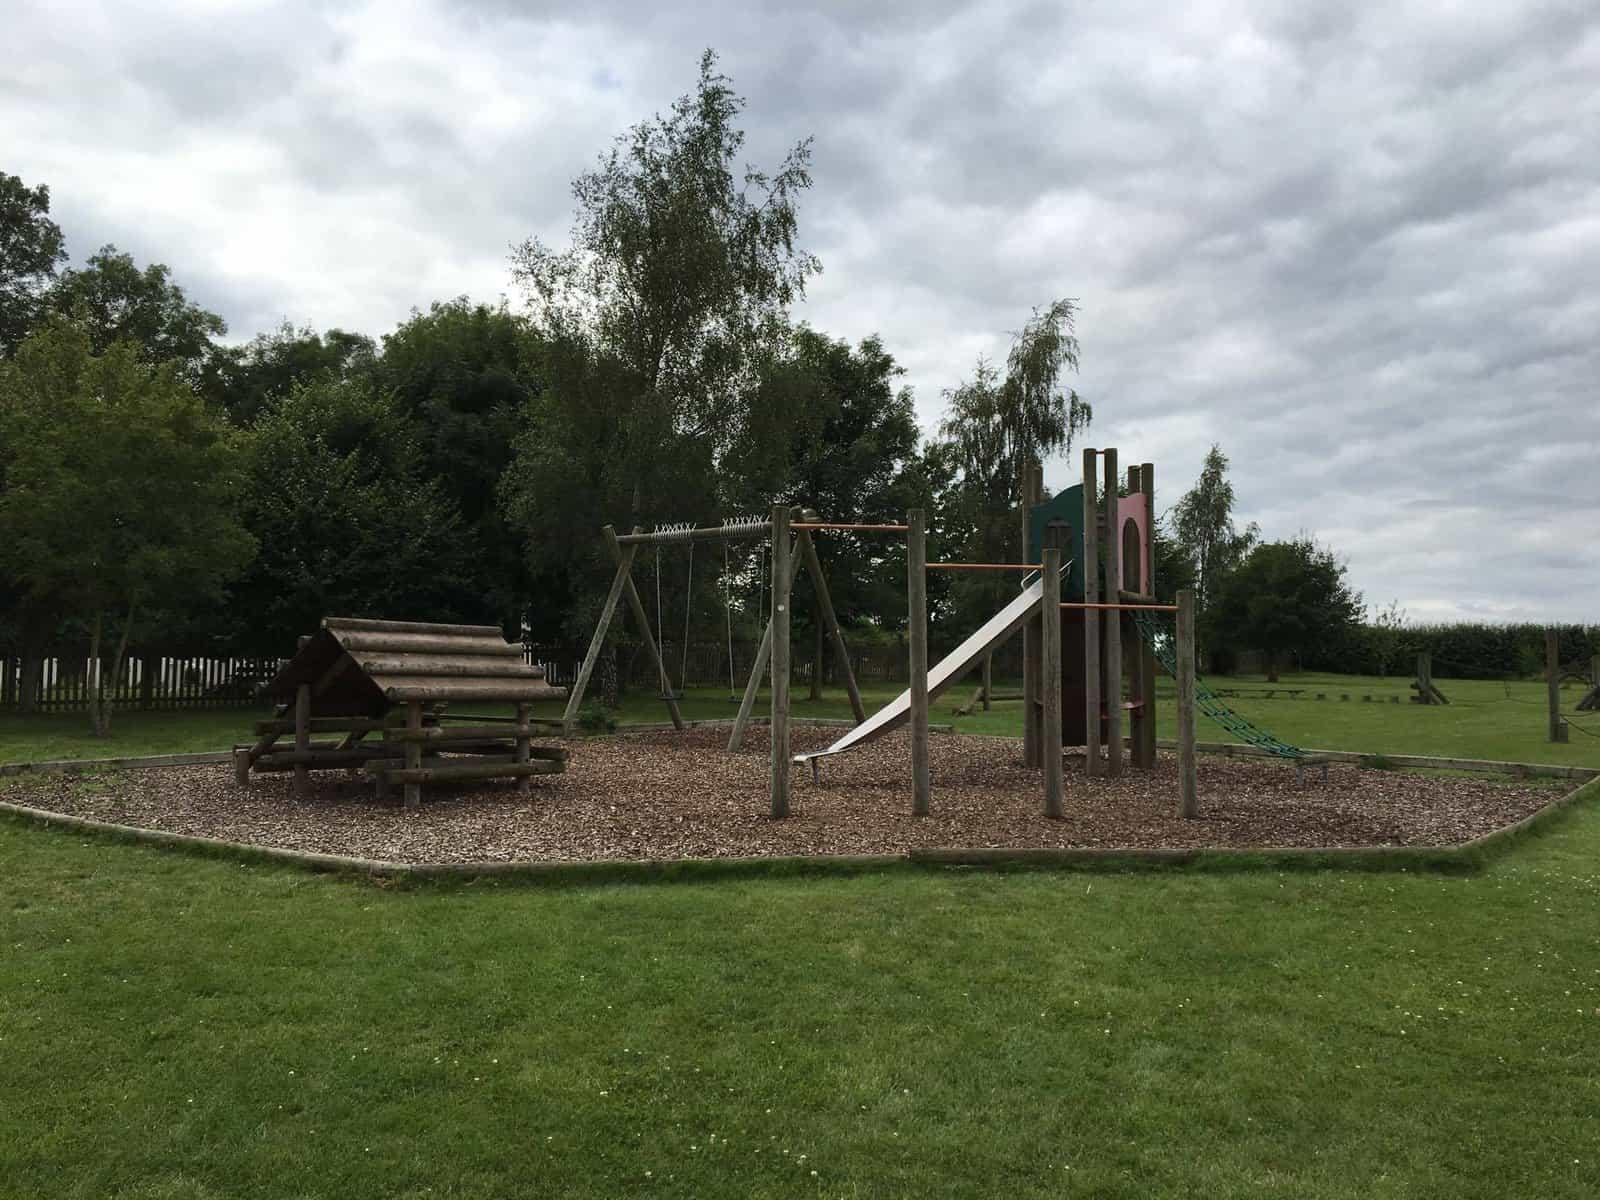 Scopwick Park